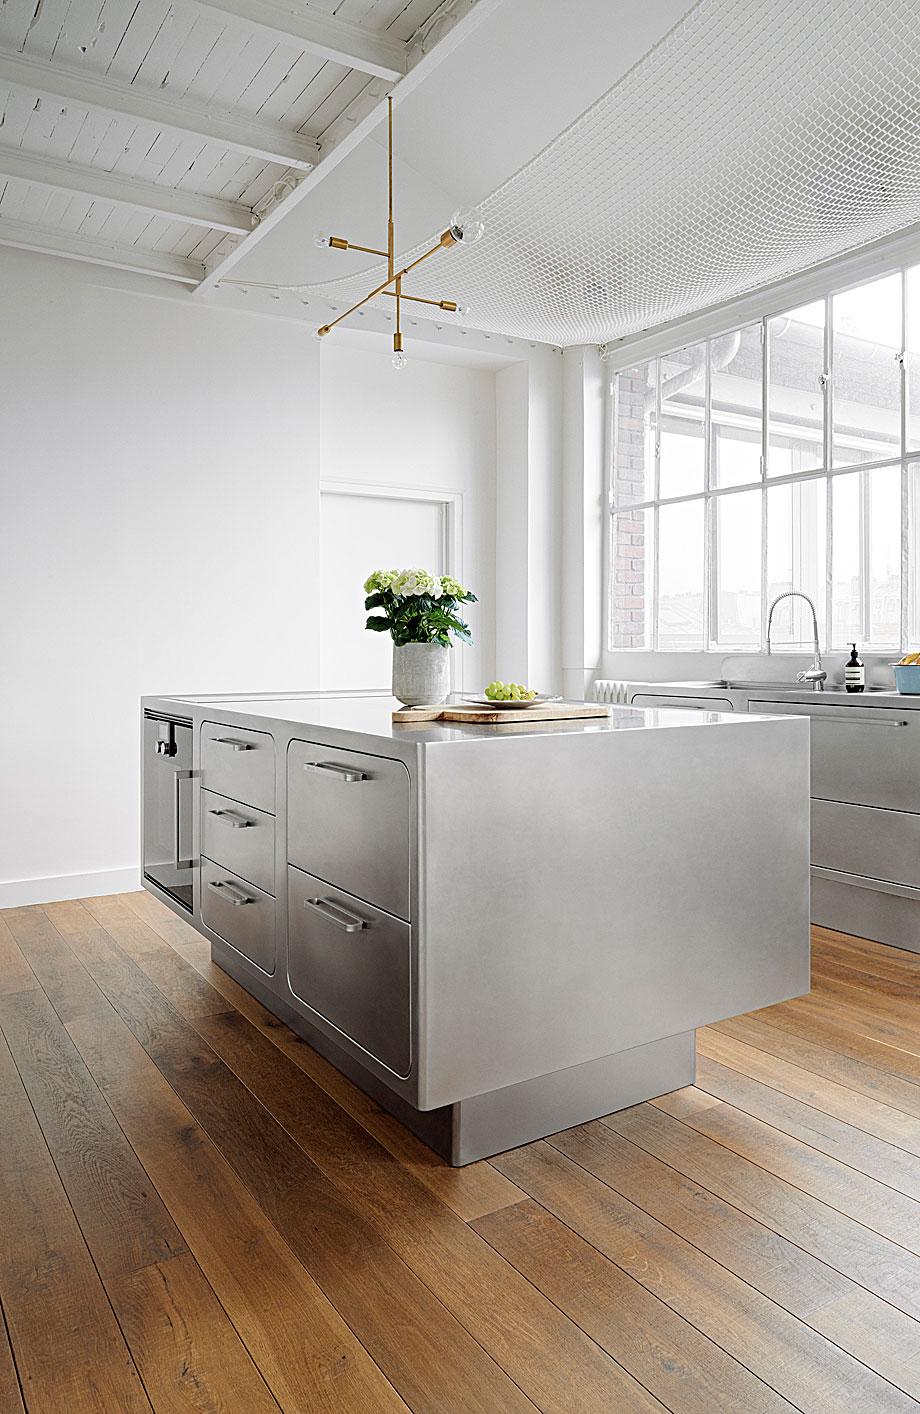 cocina-loft-paris-abimis-architecture (4)